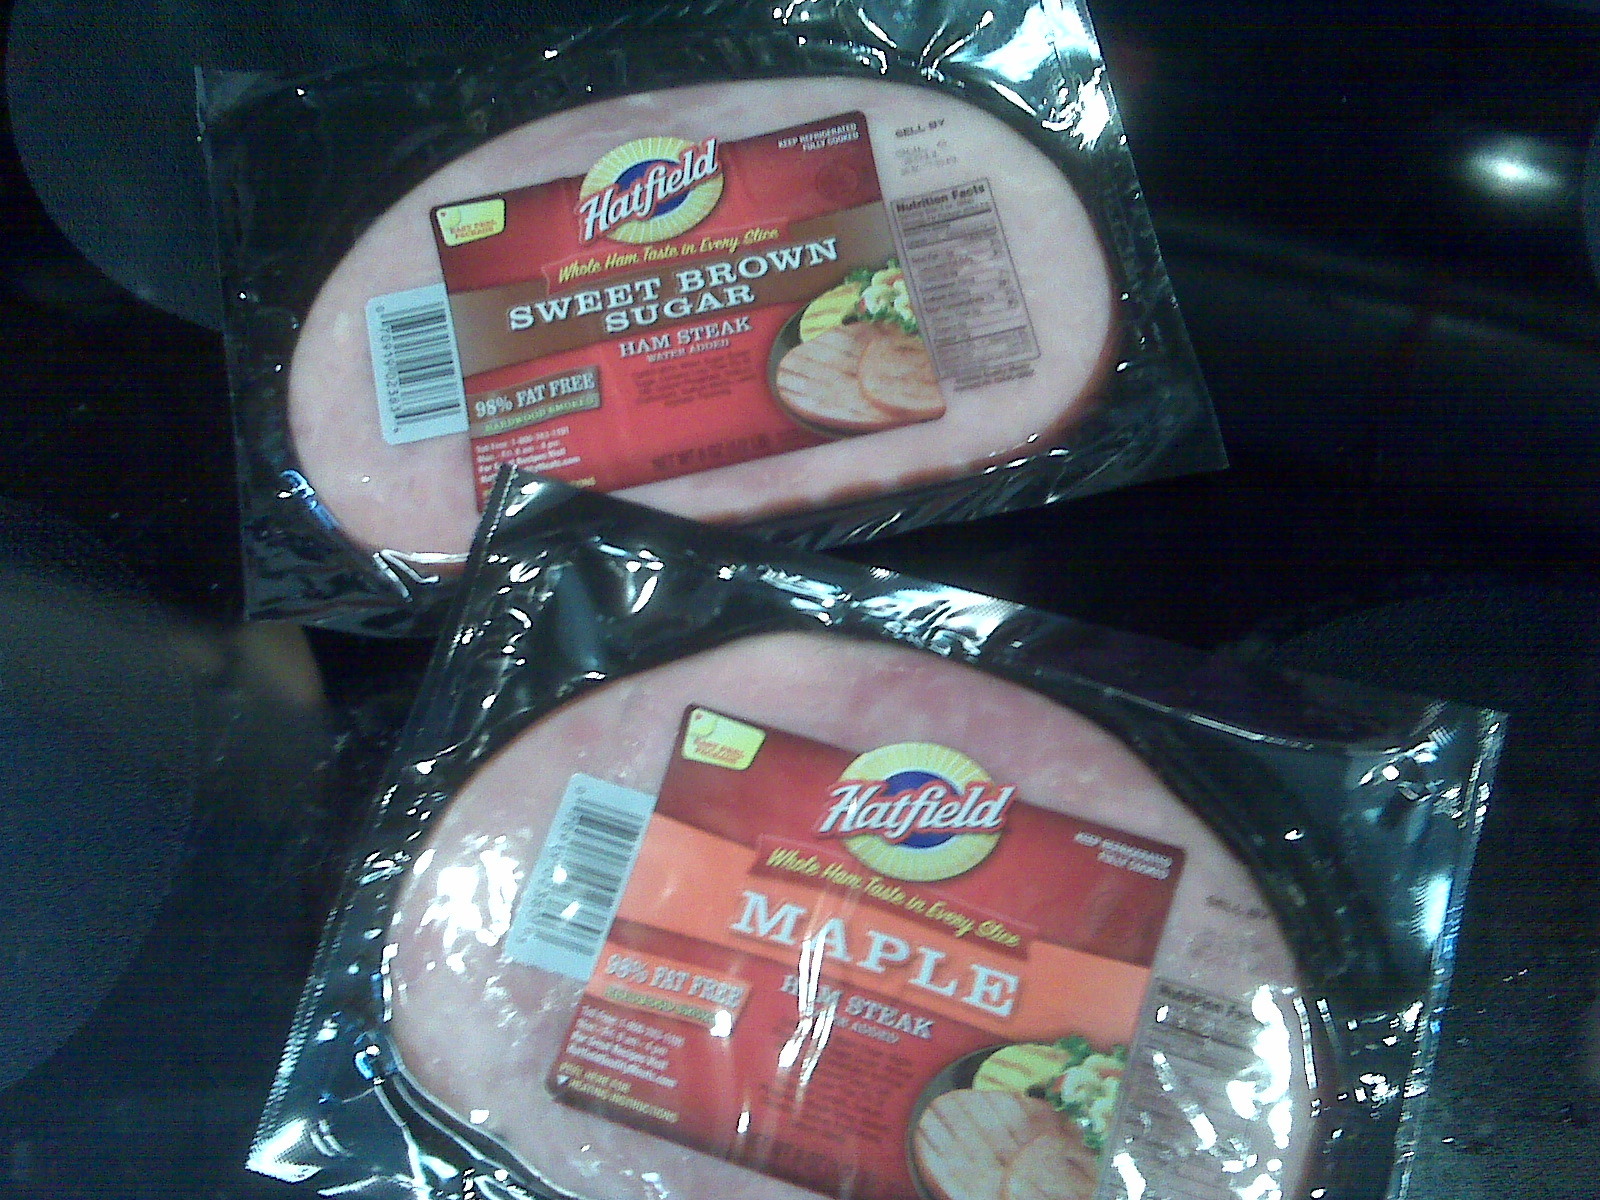 Coupon Crocodile Free Ham Steaks At Price Chopper